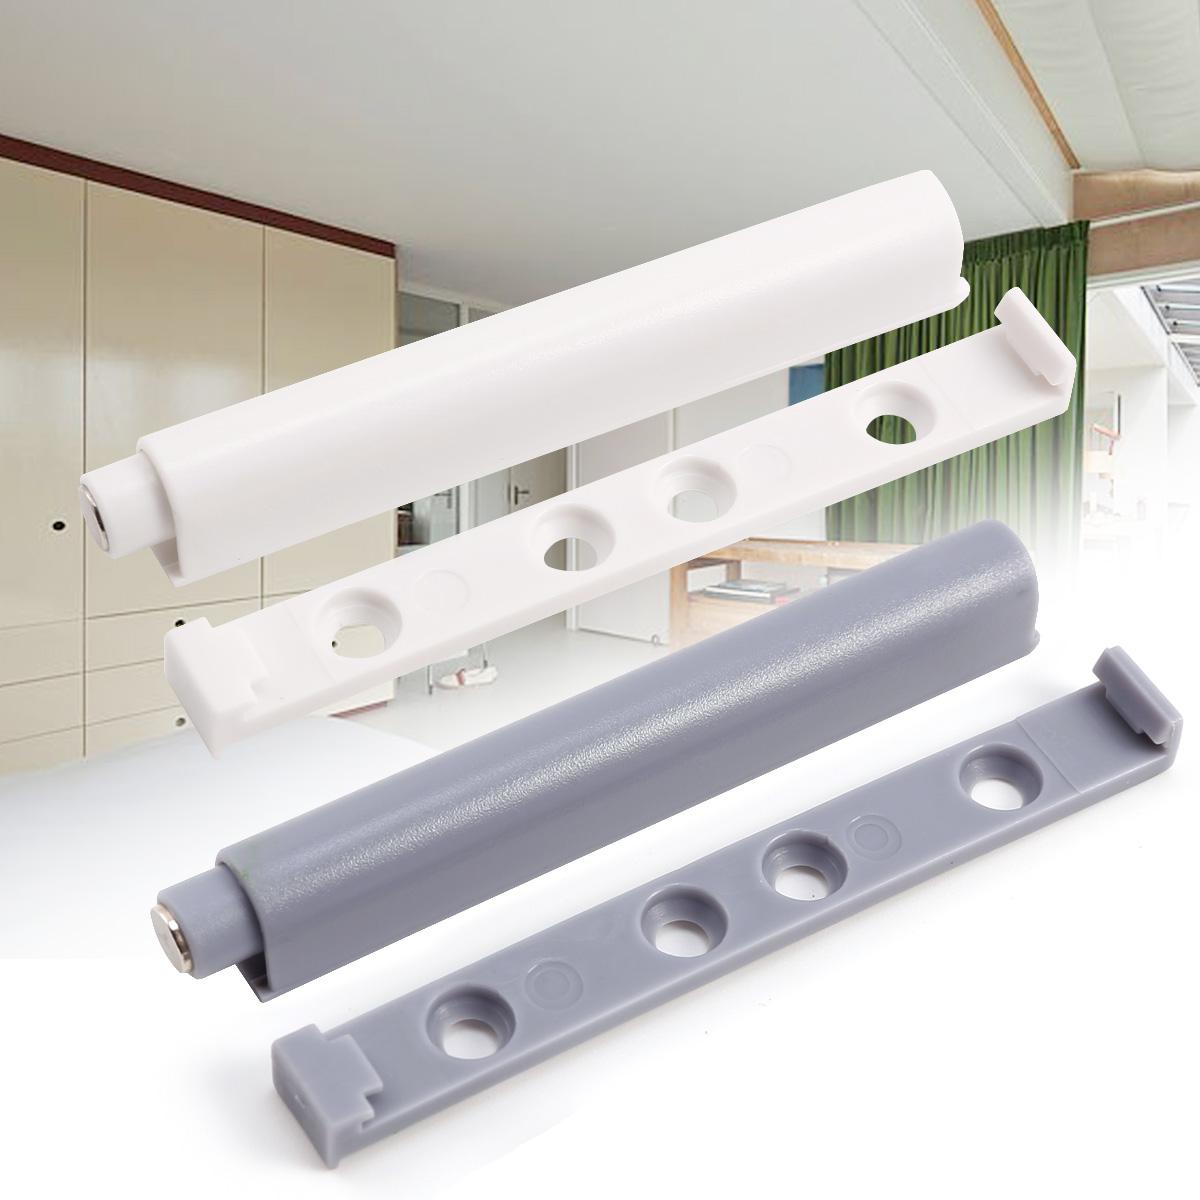 5 set amortiguadores para puerta con magn ticos del for Amortiguador armario cocina